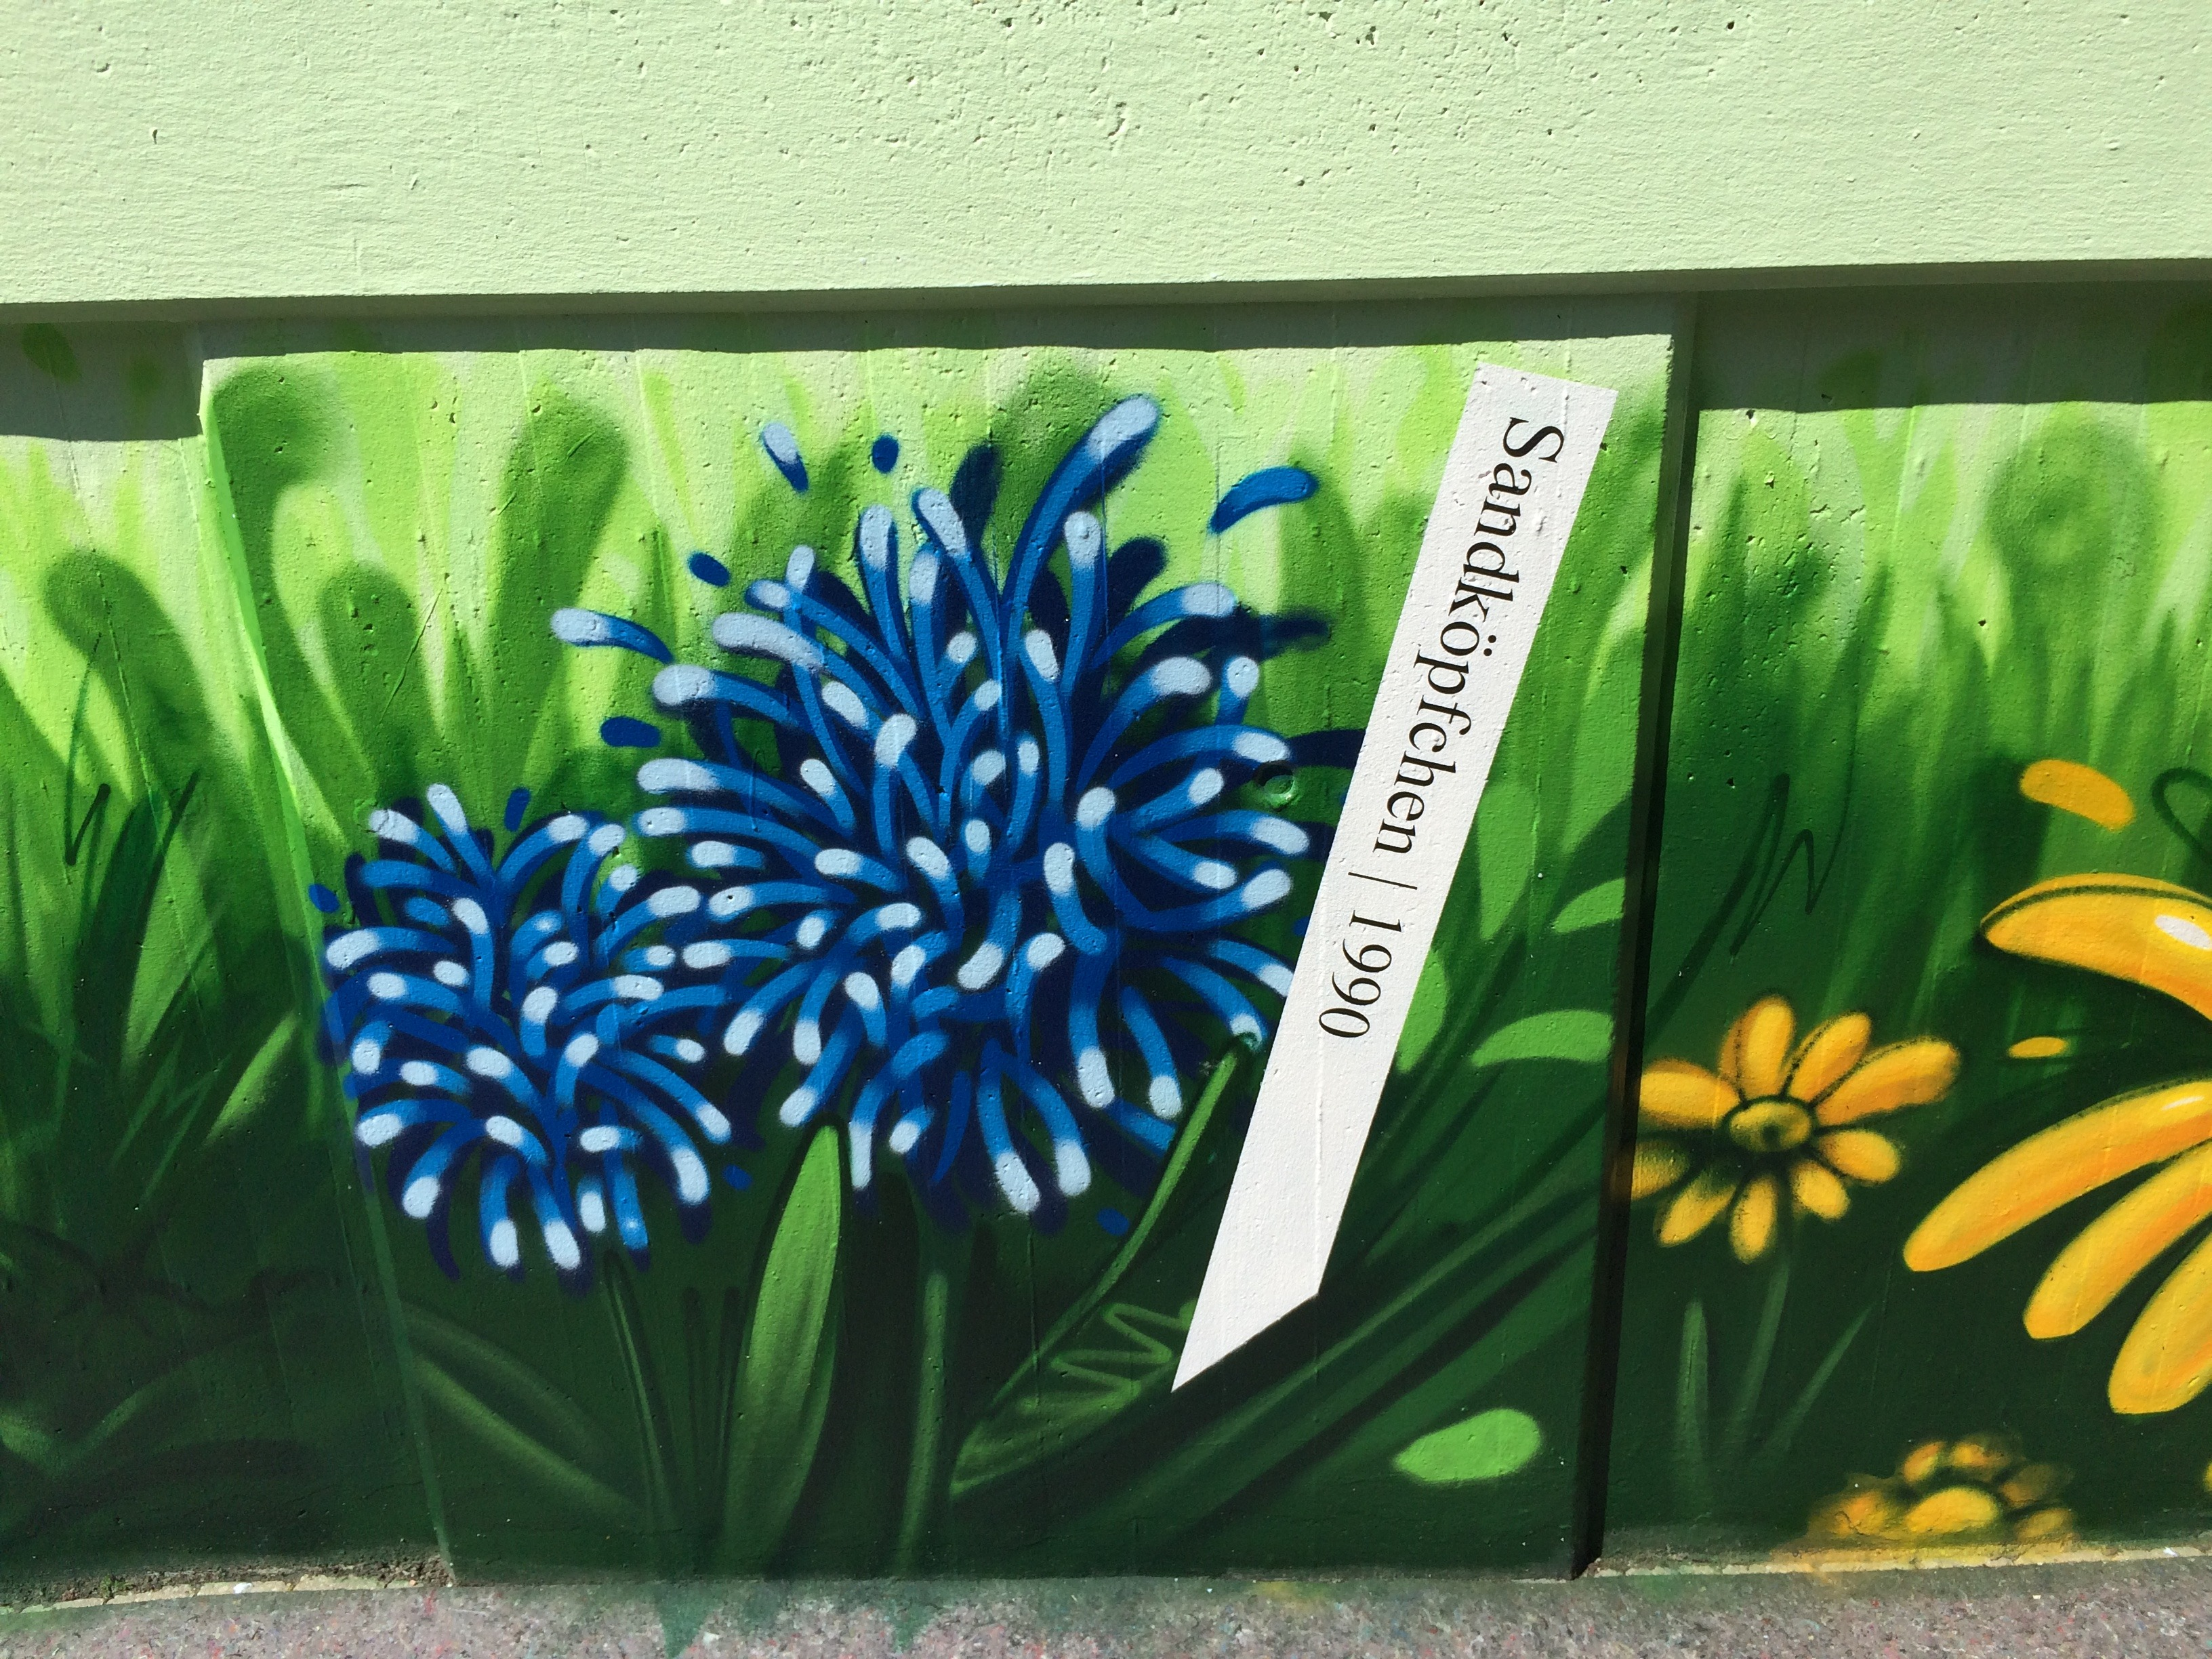 graffitiauftrag-graffitikuenstler-artmos4-deutsche_bahn_2016_hamburg_pflanzen_landschaft_grün_weiß_schrift_aussen_verkehrsbetrieb